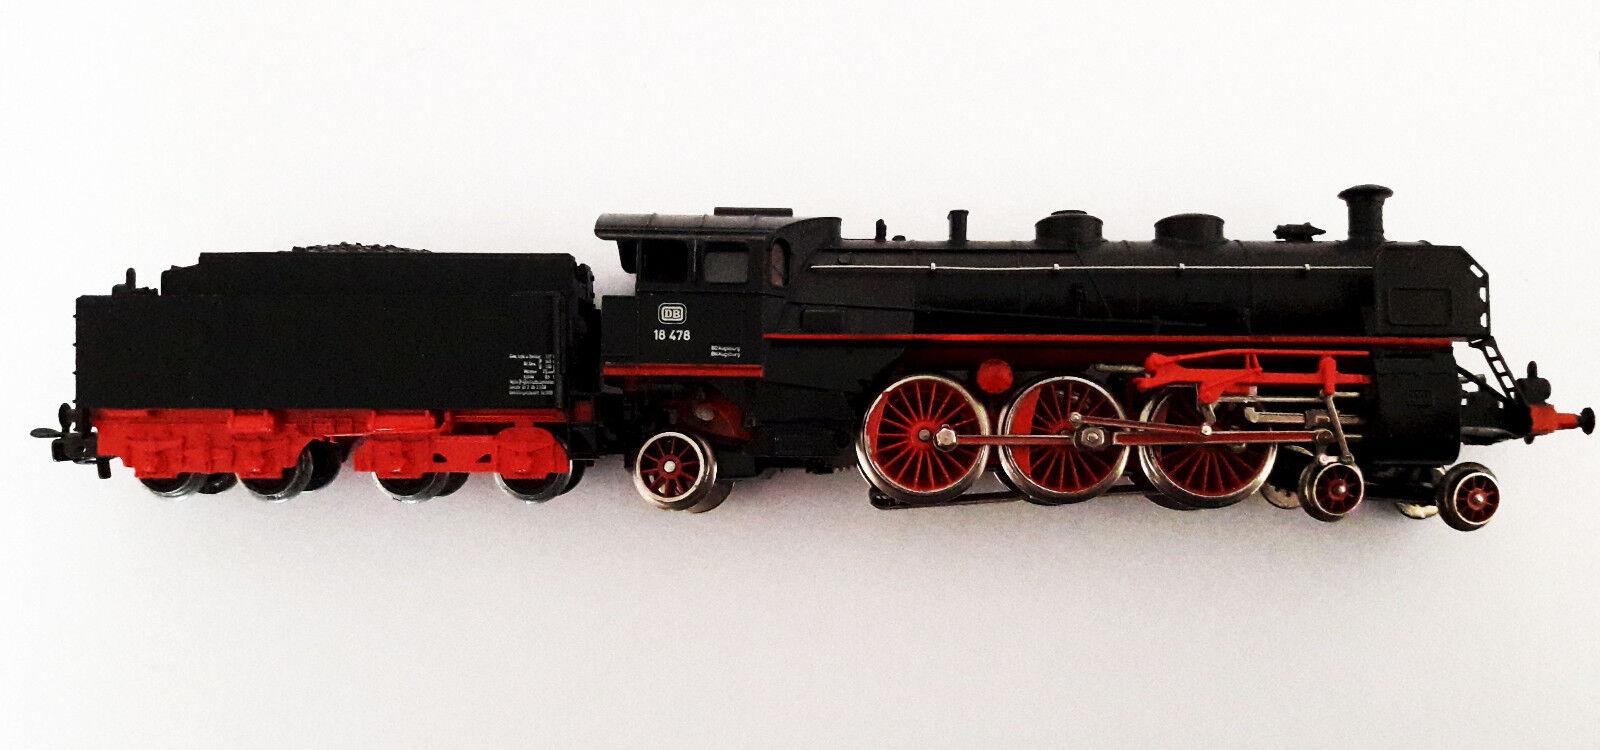 , h0, 3093, locomotiva a vapore BR 18478 DB, metallo pieno